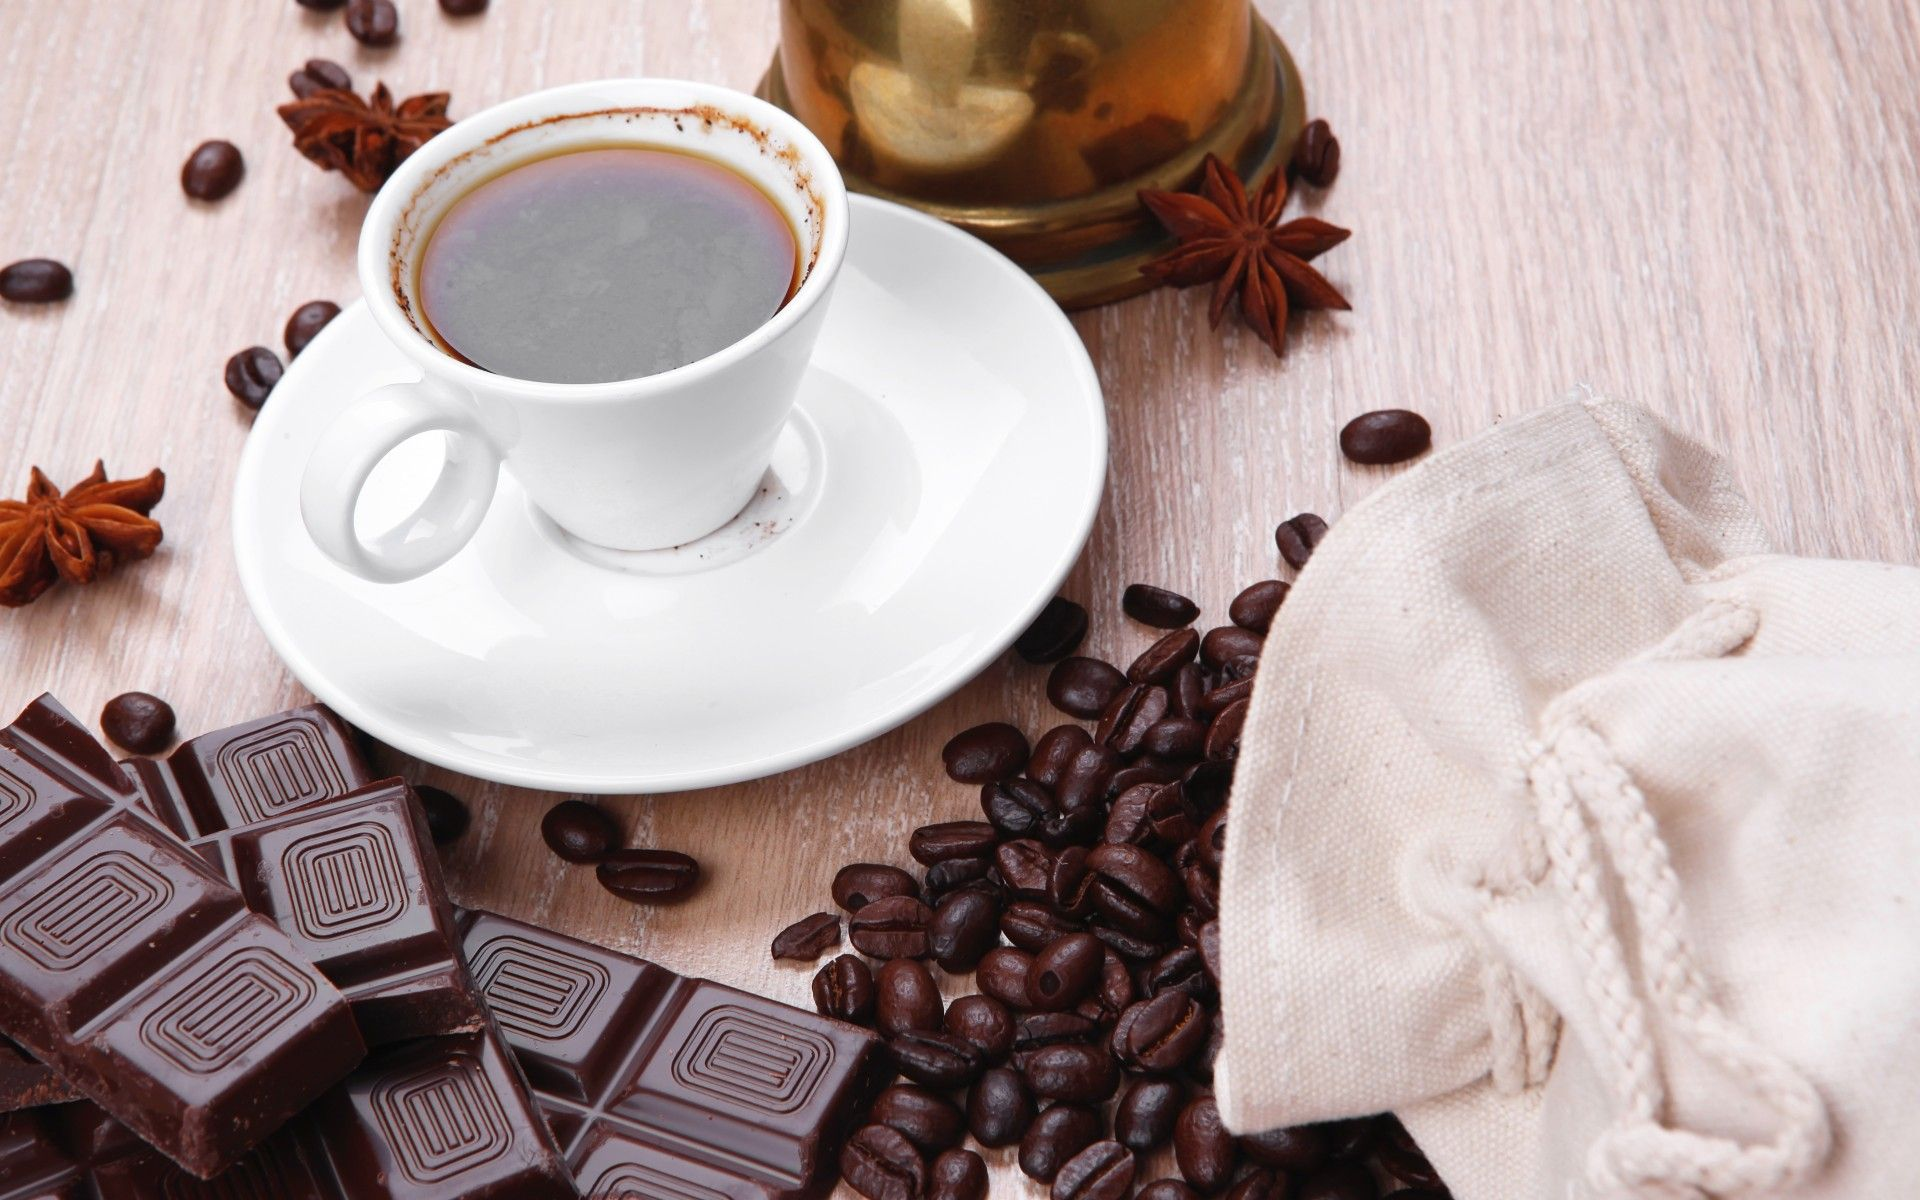 фото чашка кофе и шоколад посадят